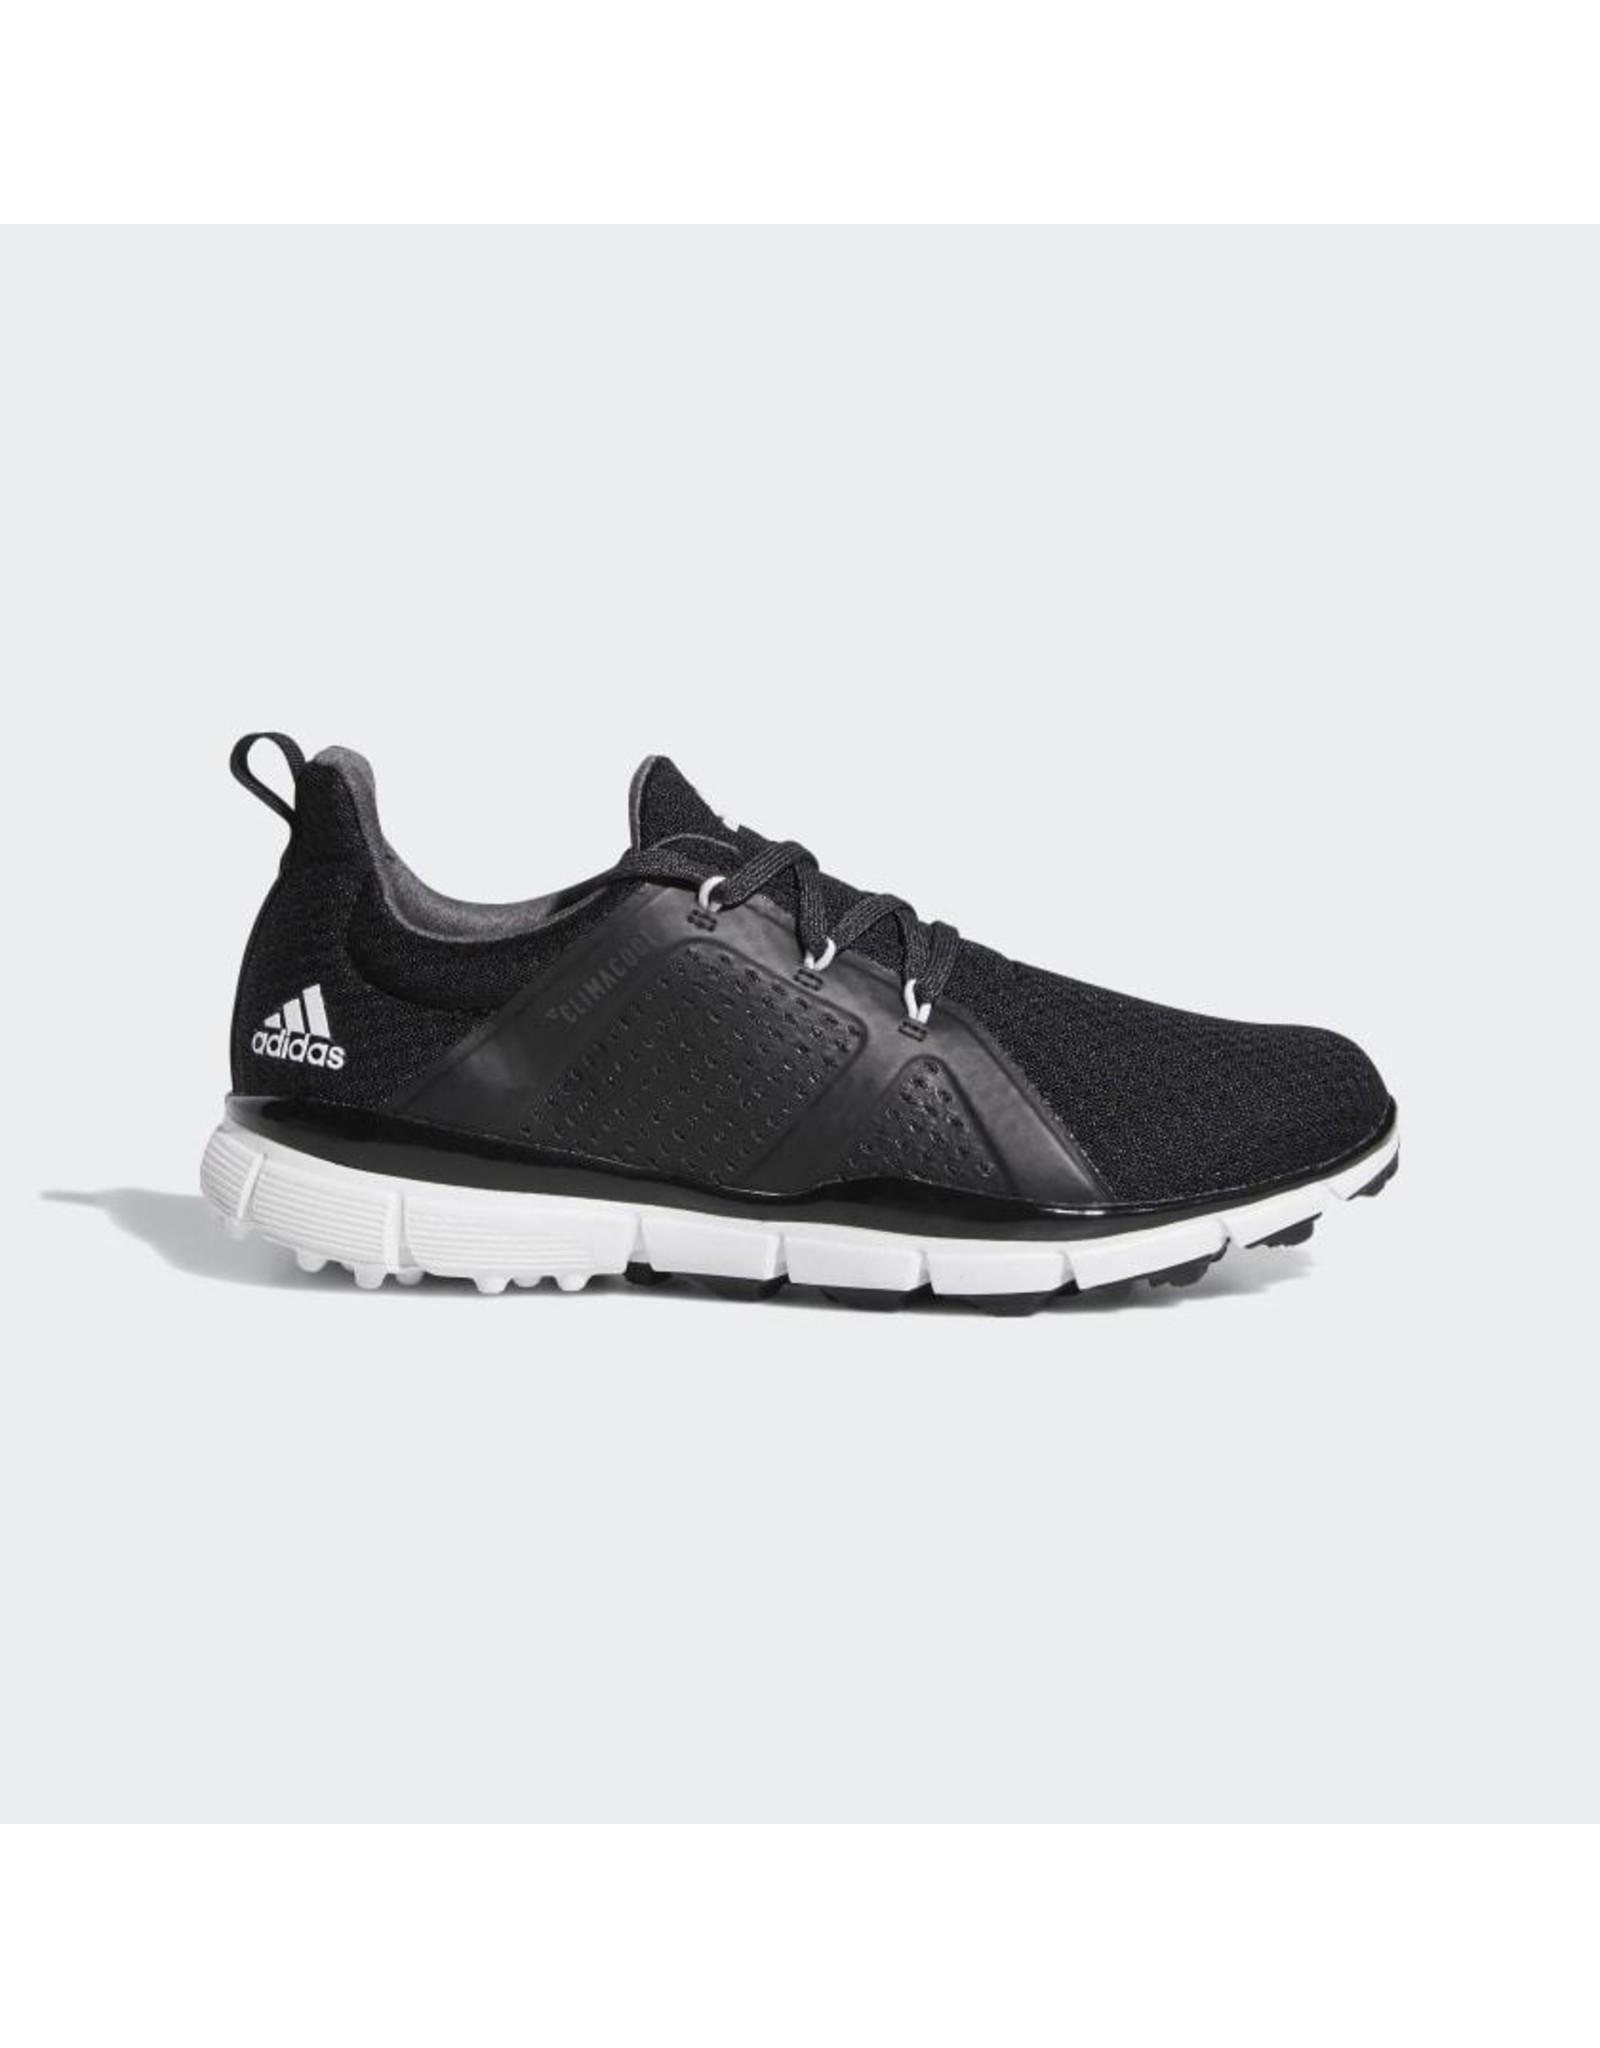 Adidas Adidas Women's Climacool Cage Black